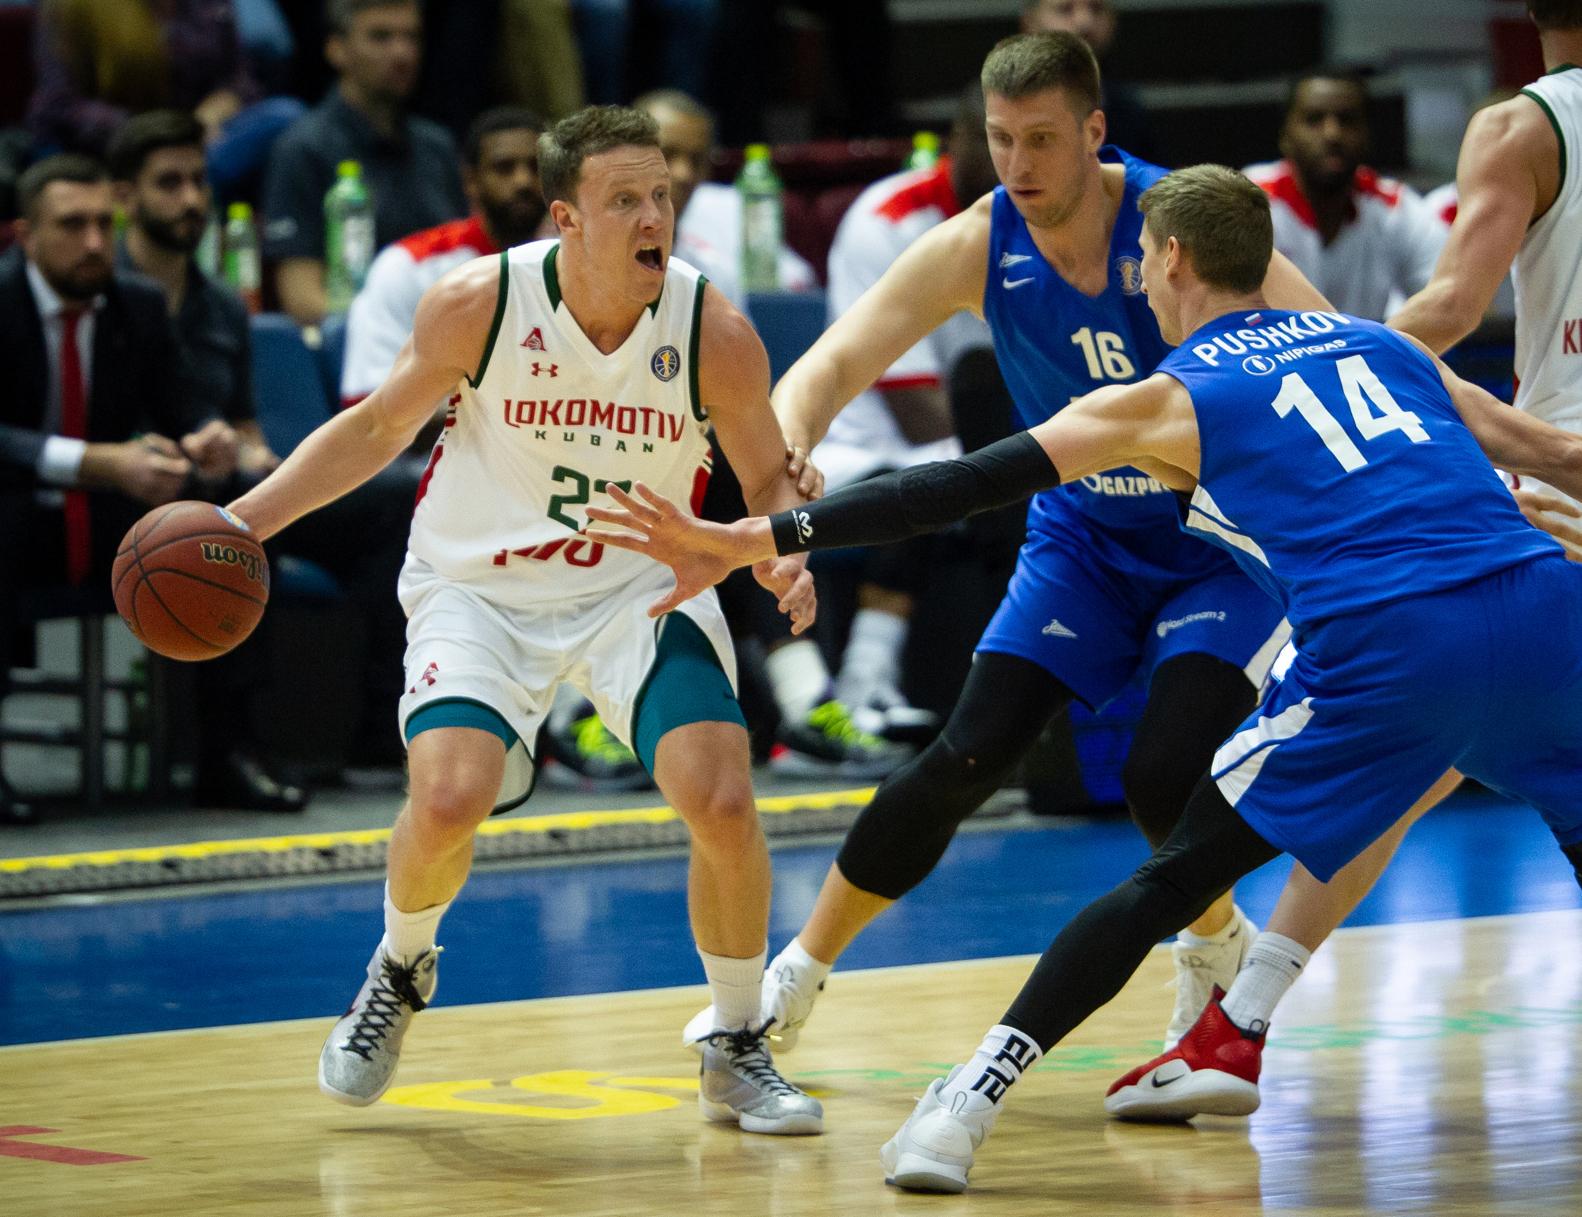 Lokomotiv Clinches Home-Court Advantage, Zenits Drops 4th Straight